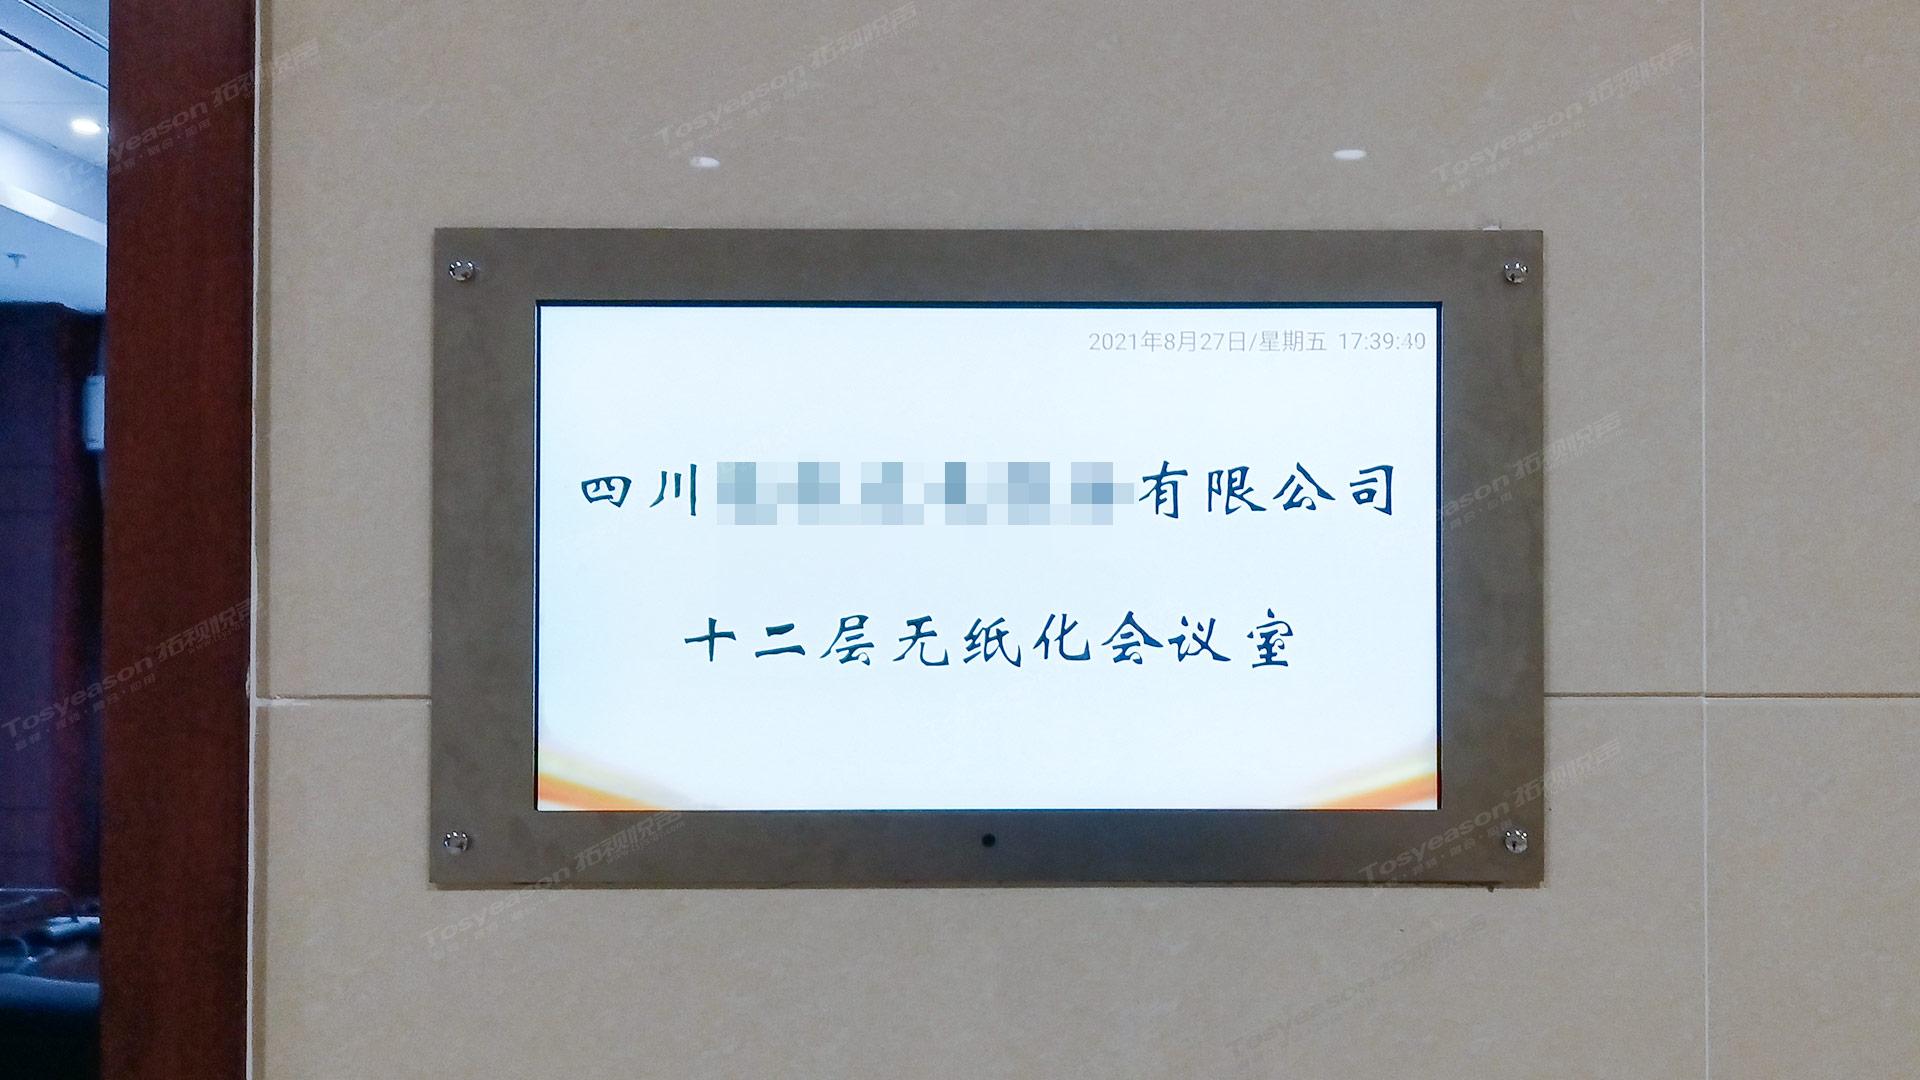 12c2.jpg